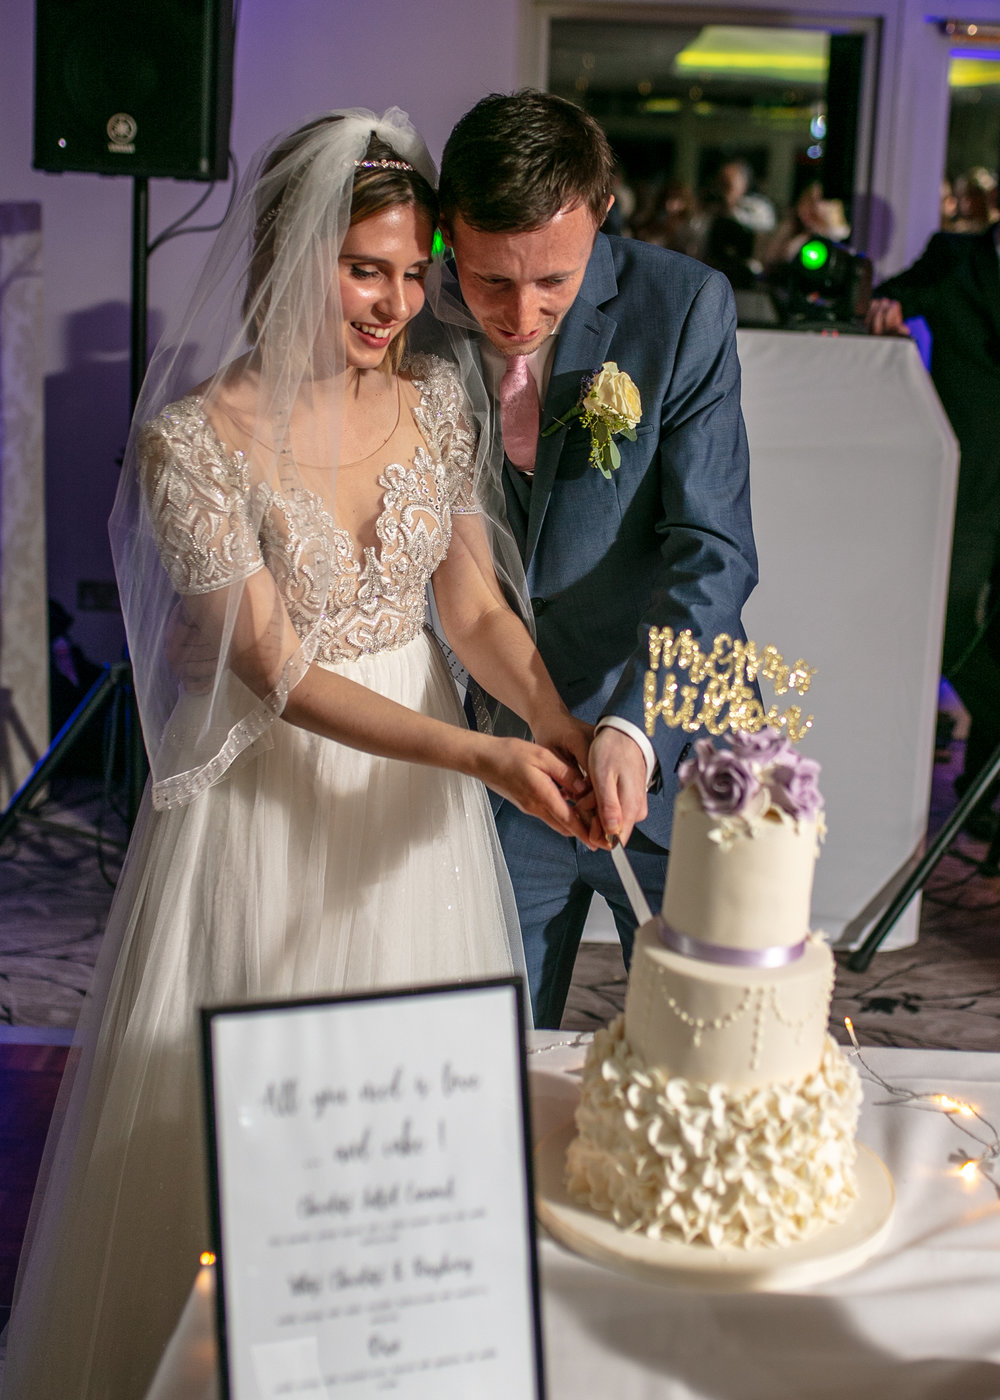 Charringworth-Manor-Wedding-Photography49.jpg